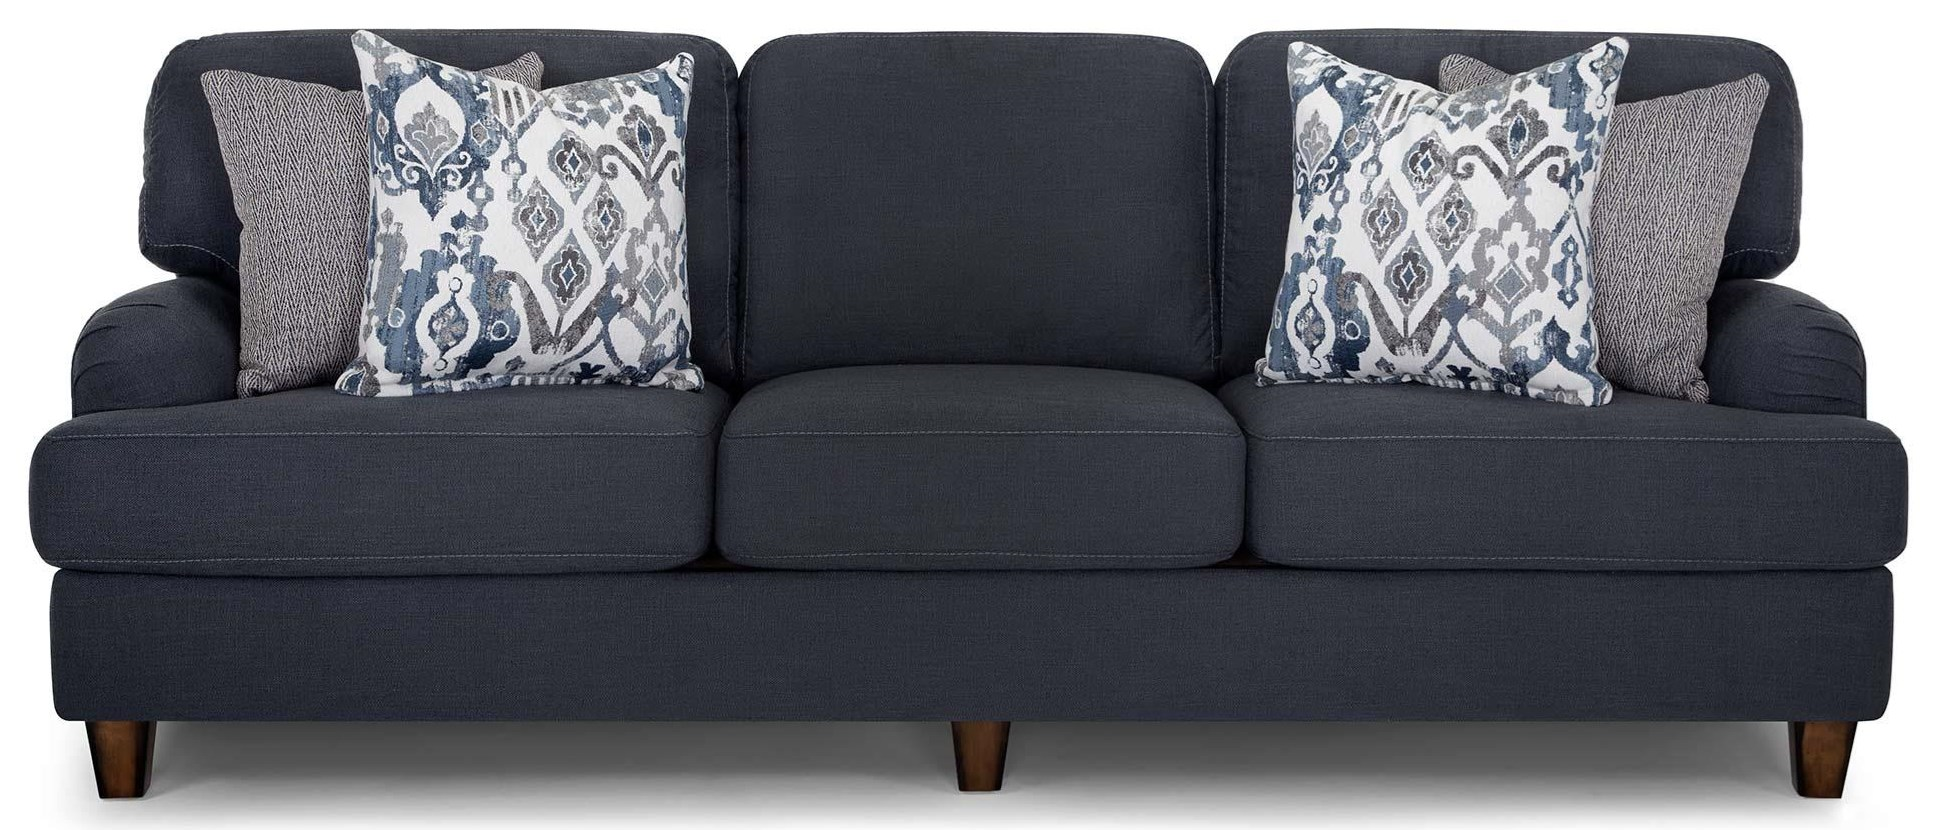 886 Sofa by Franklin at Furniture Fair - North Carolina